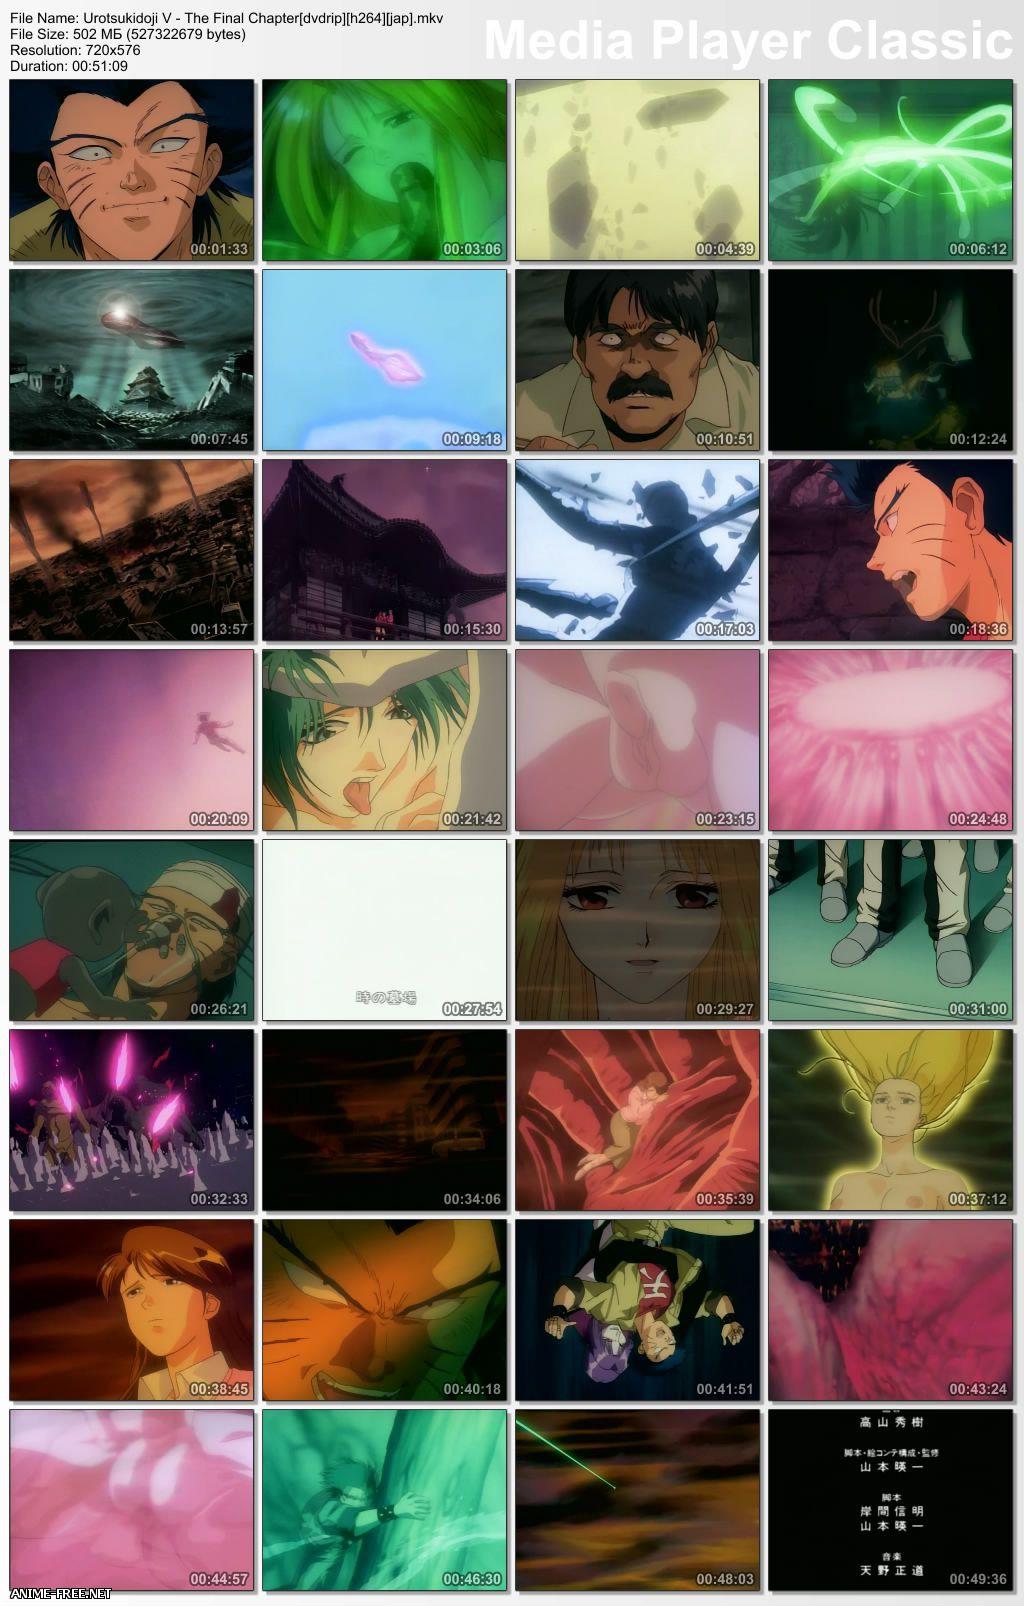 Urotsukidoji - Full Original Saga / Urotsuki/Choujin Densetsu Urotsukidouji / Уроцукидодзи - Полное собрание [6 из 6 + Sp] [RUS,ENG,JAP] Anime Hentai